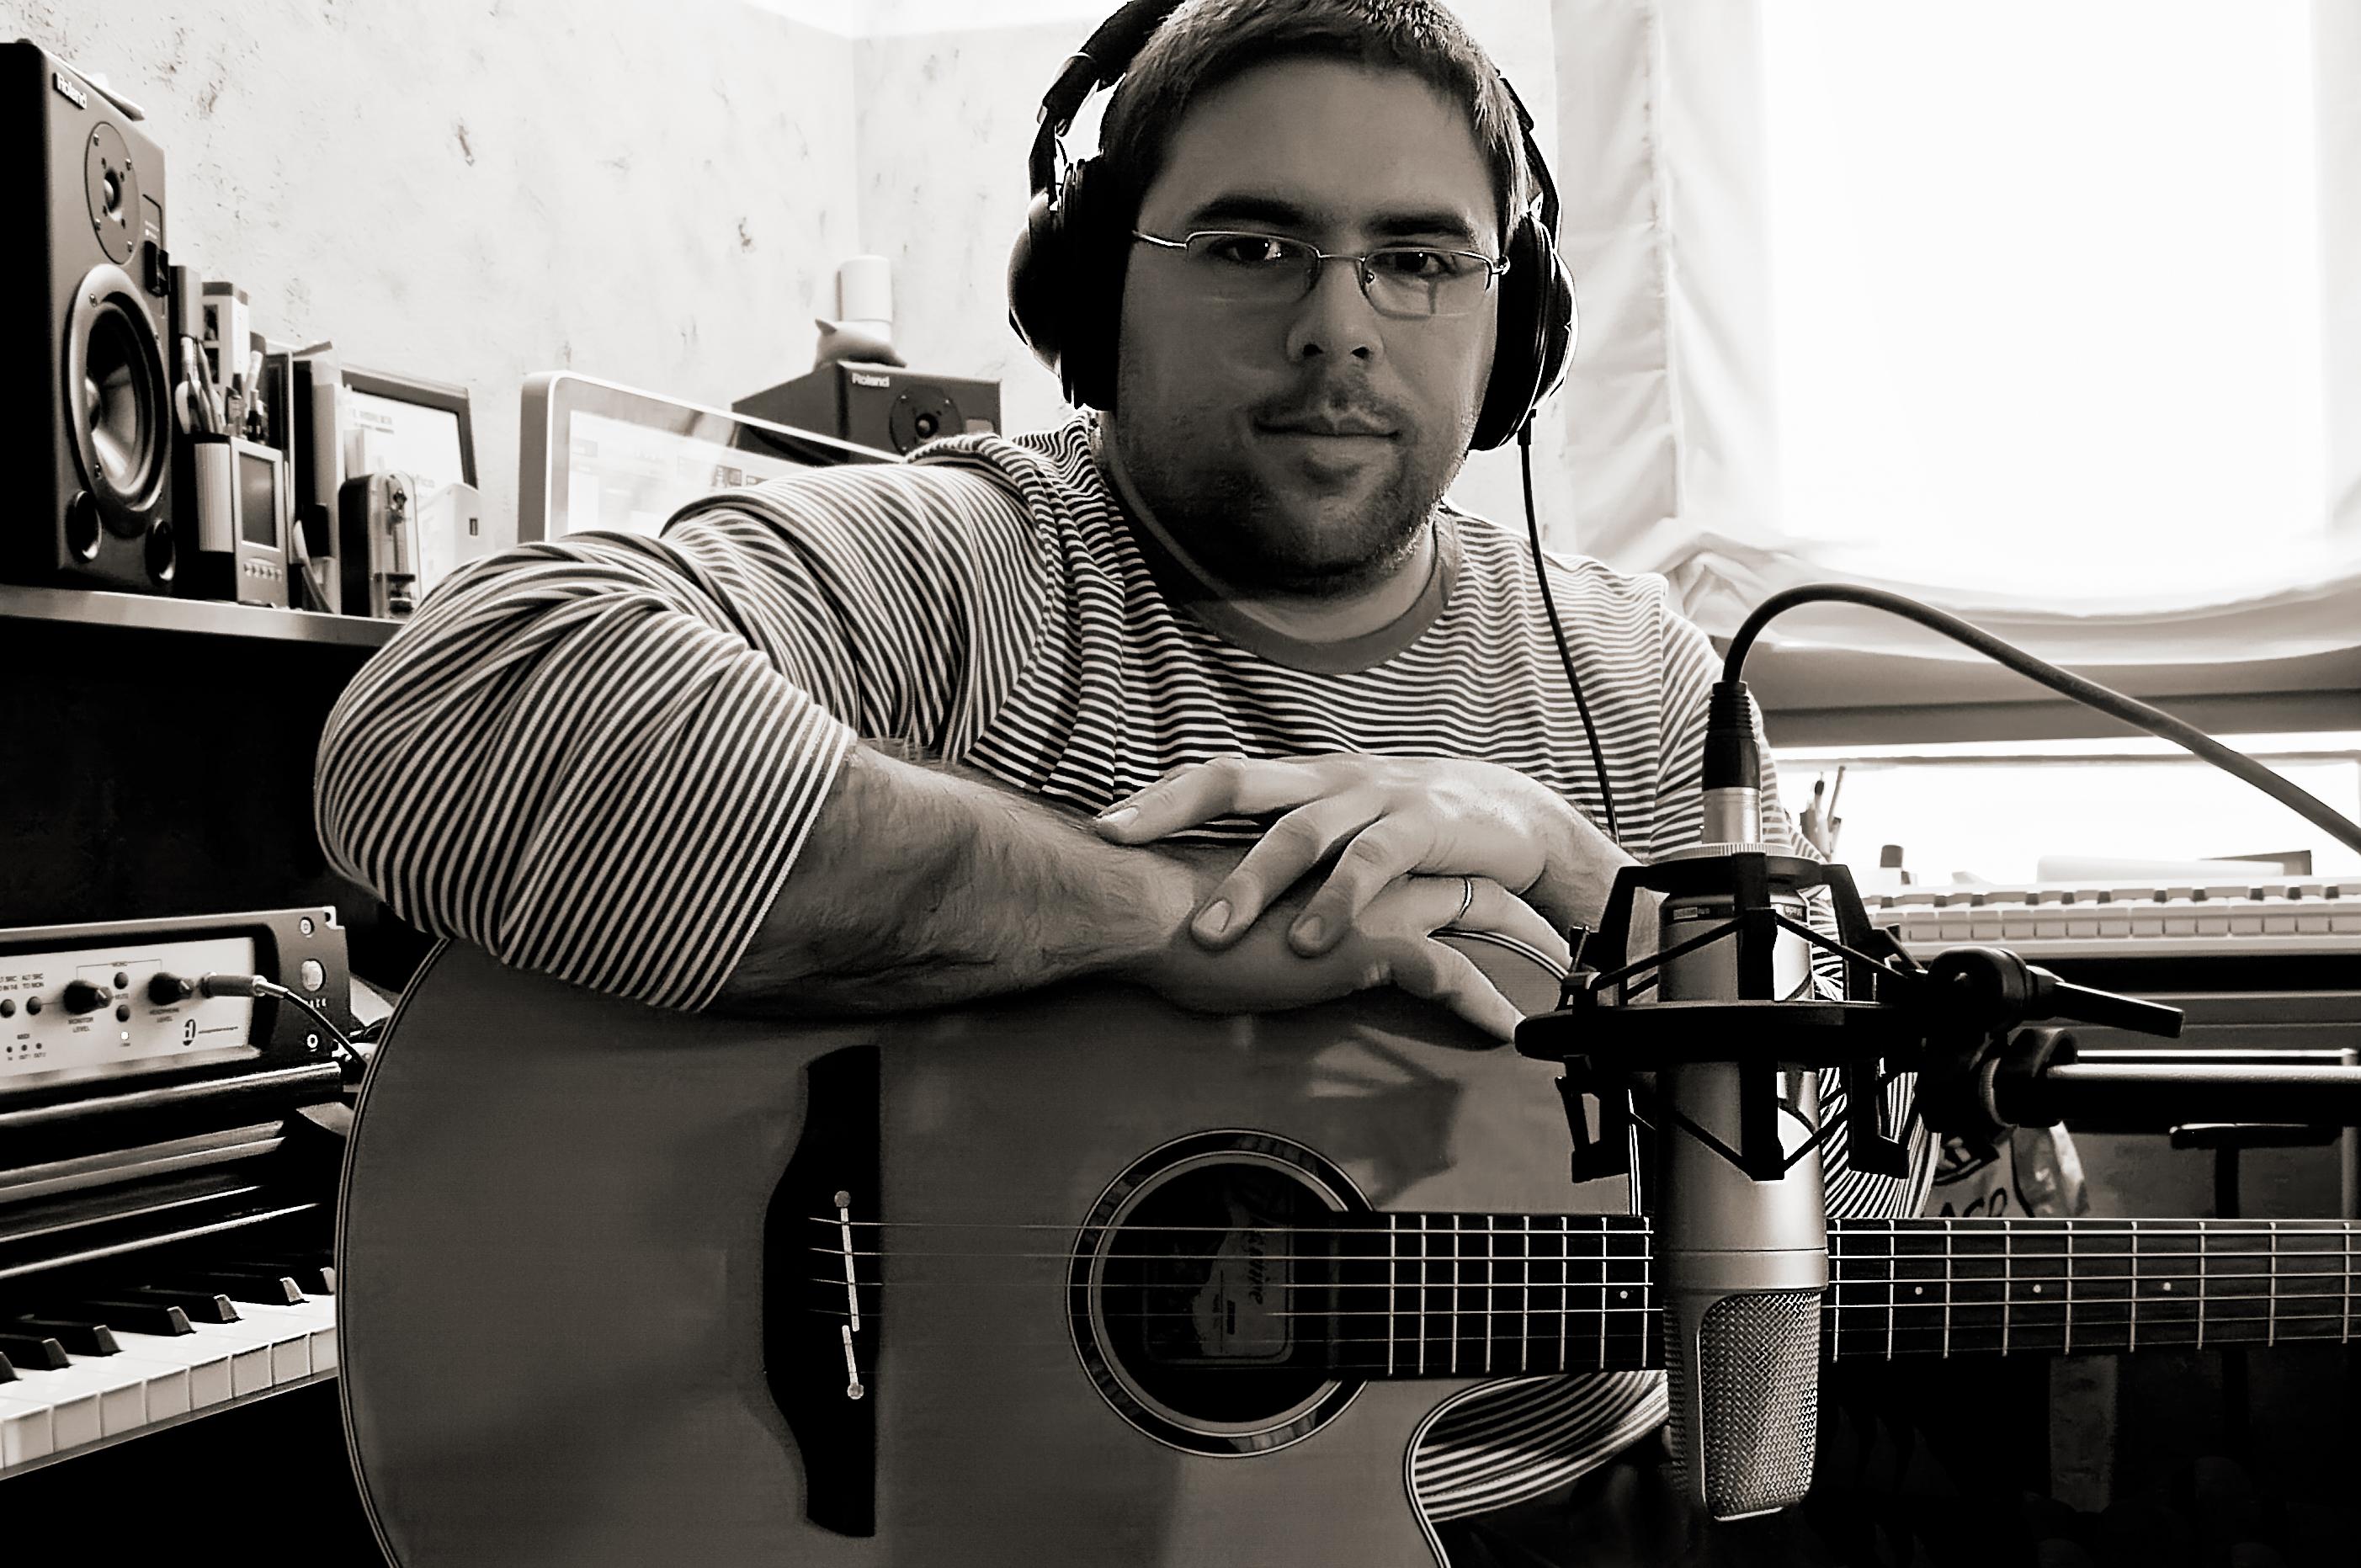 Javi con guitarra